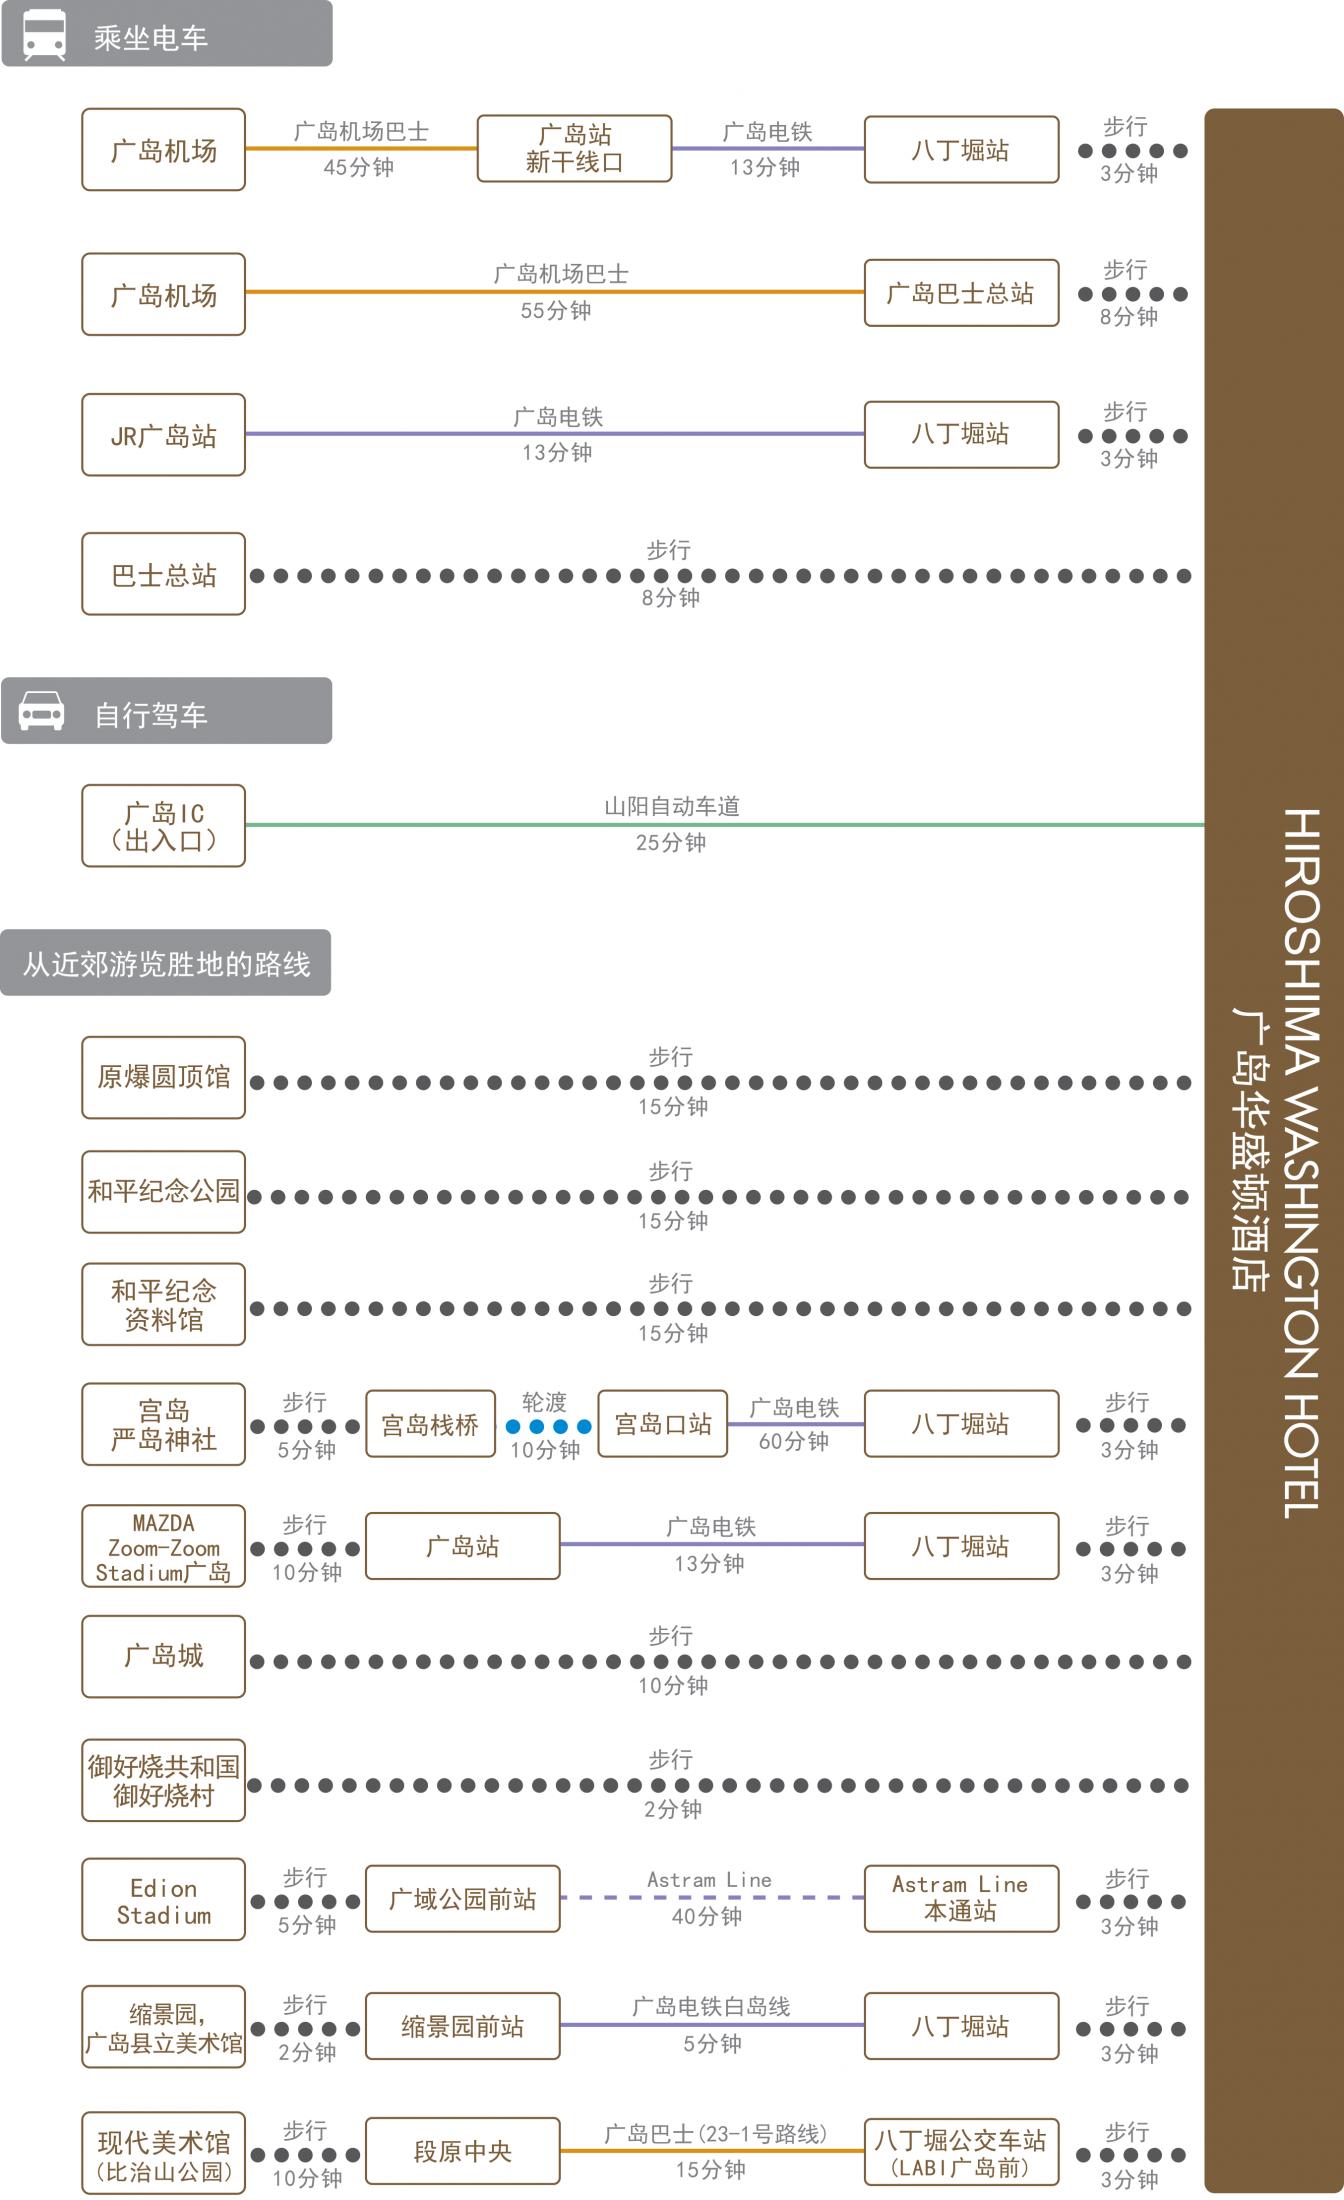 chart_zh_cn_hiroshima_wh